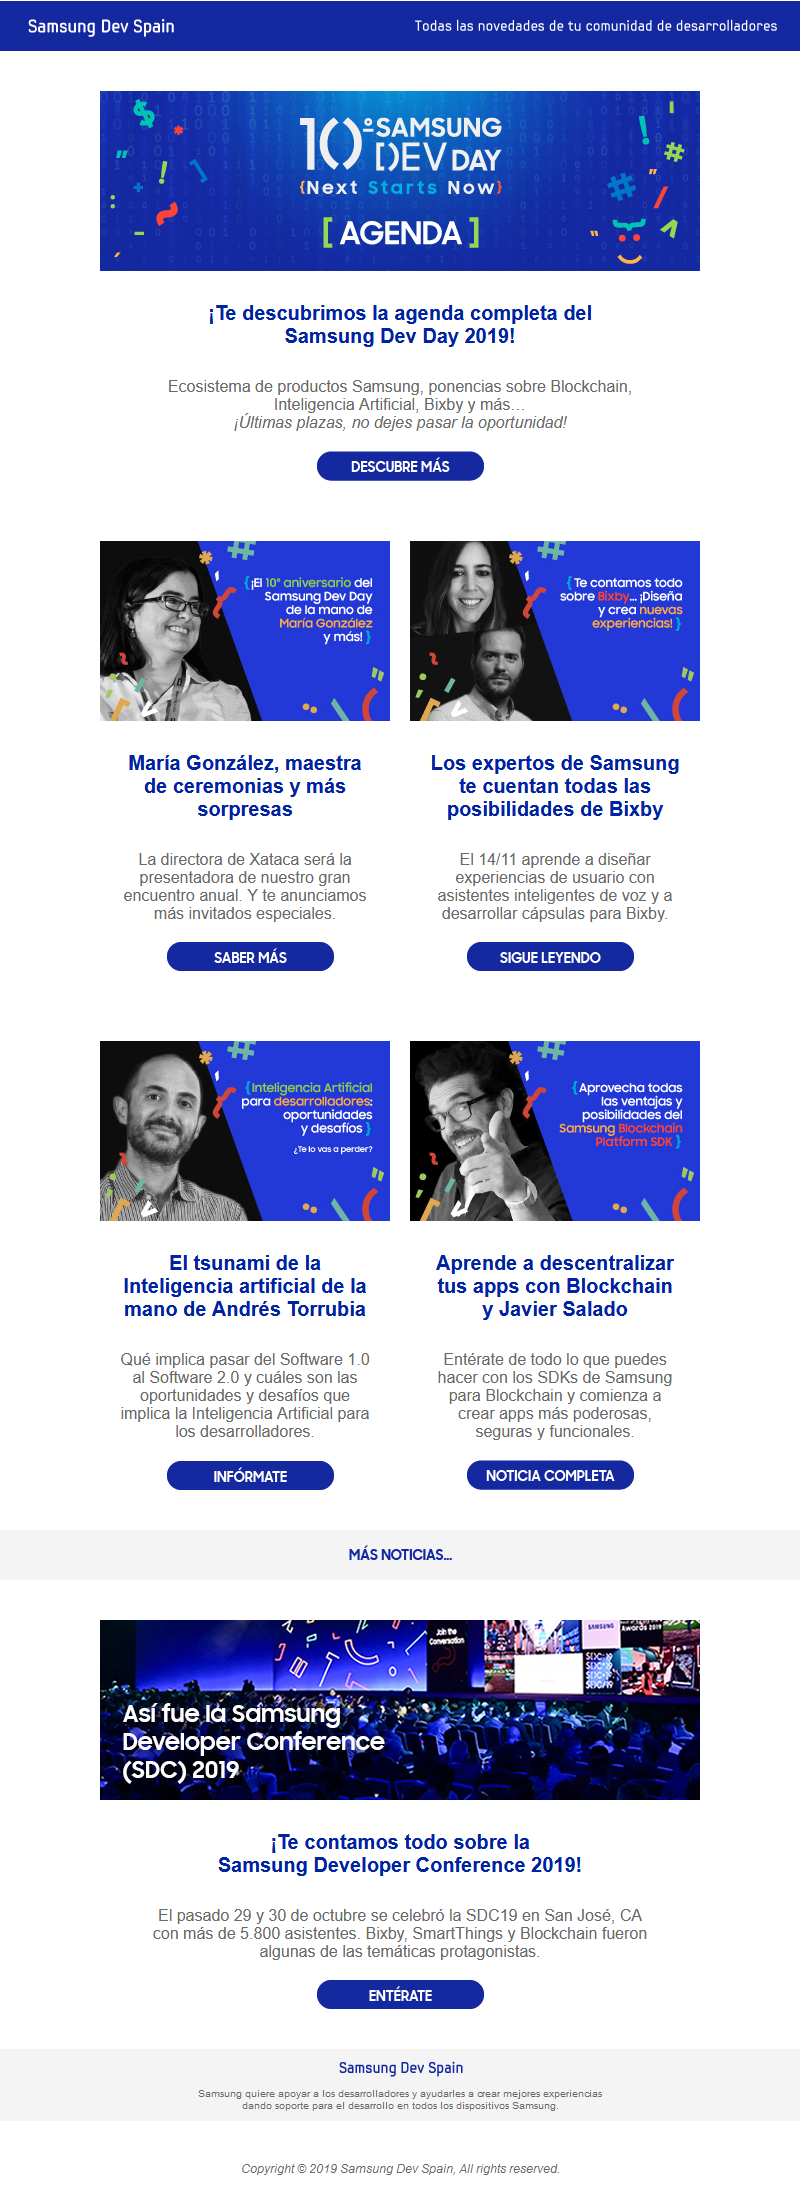 Image of Samsung Dev Team campaign